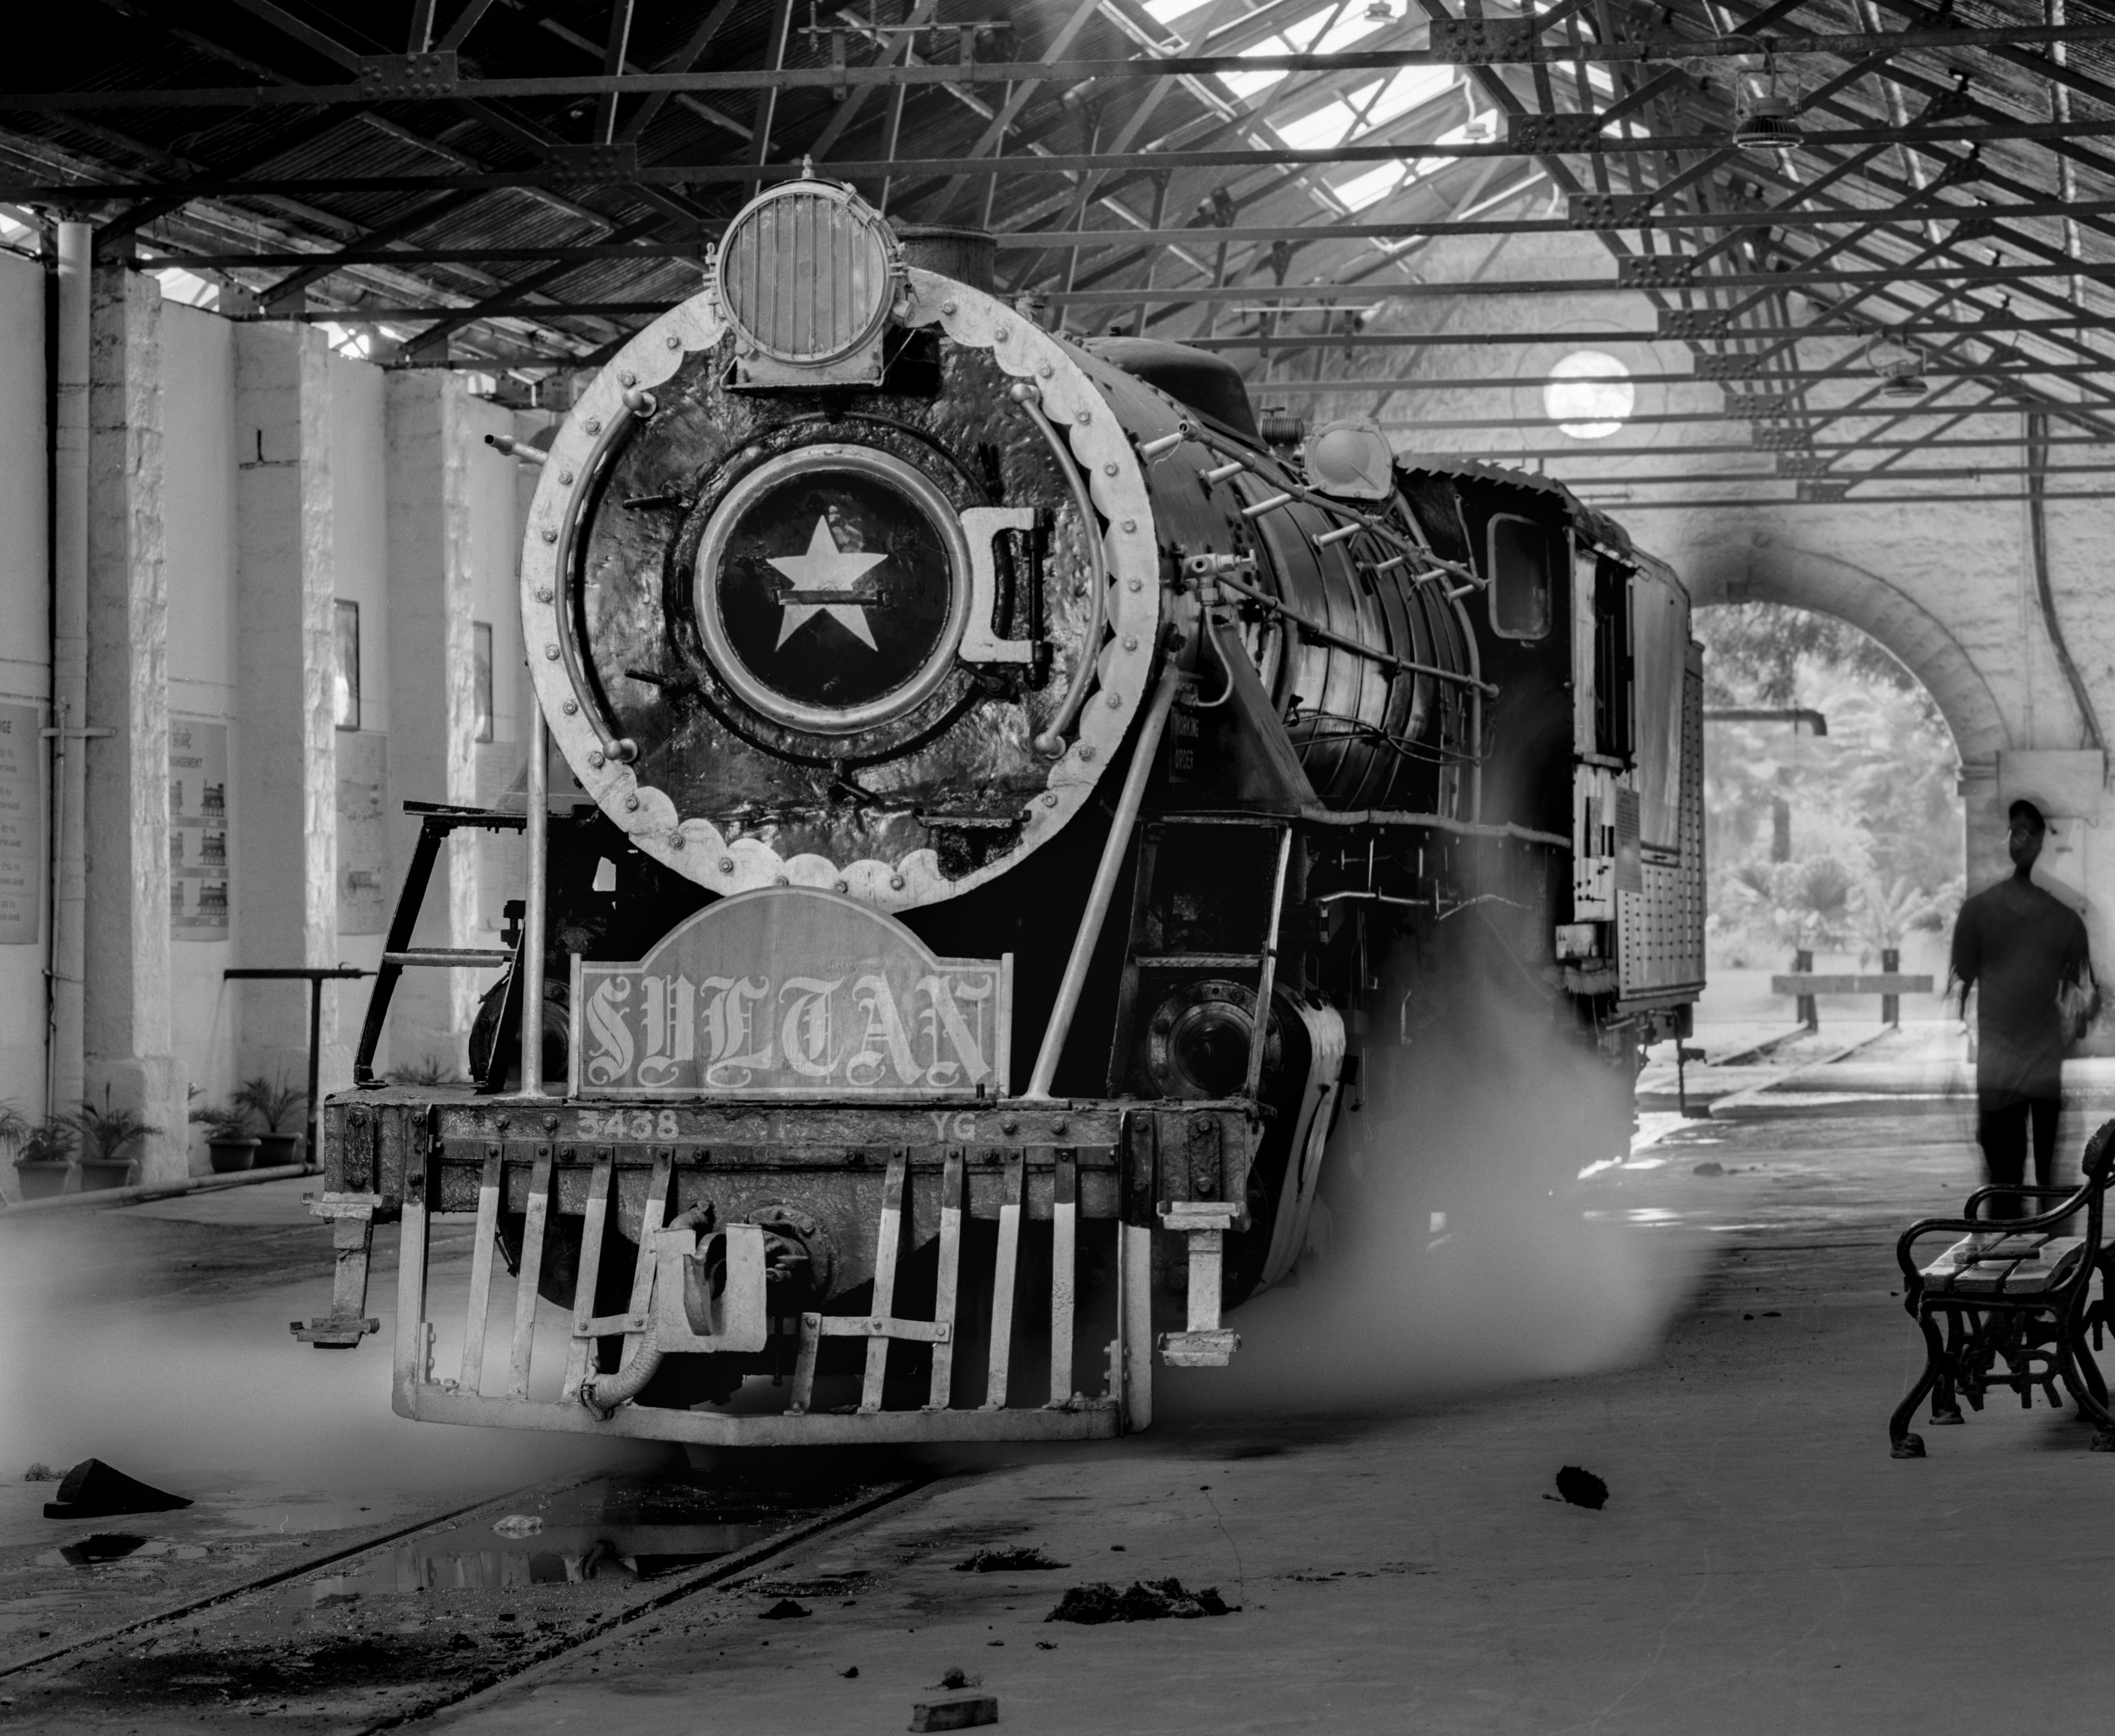 Steam train in shed (Pic: Nandakumar Narasimhan)